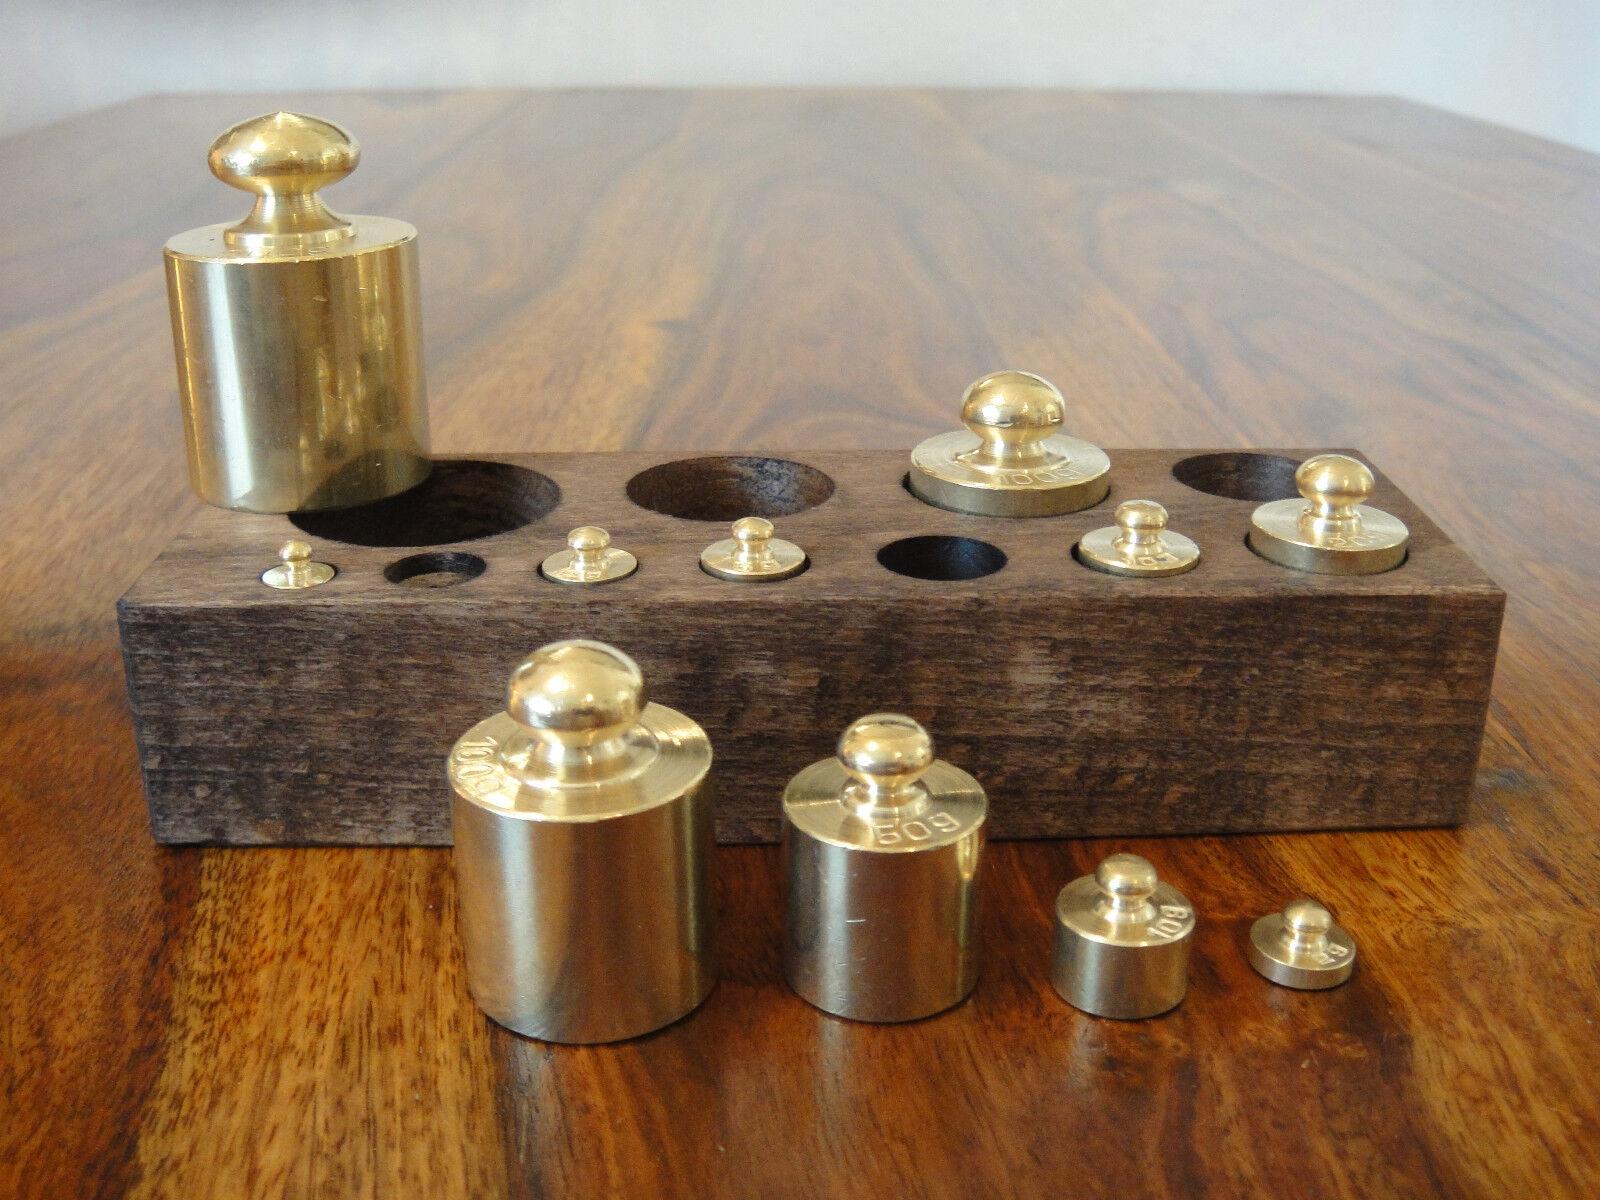 11 poids set laiton pour balance balance formaliser Charger balance gewichtssatz